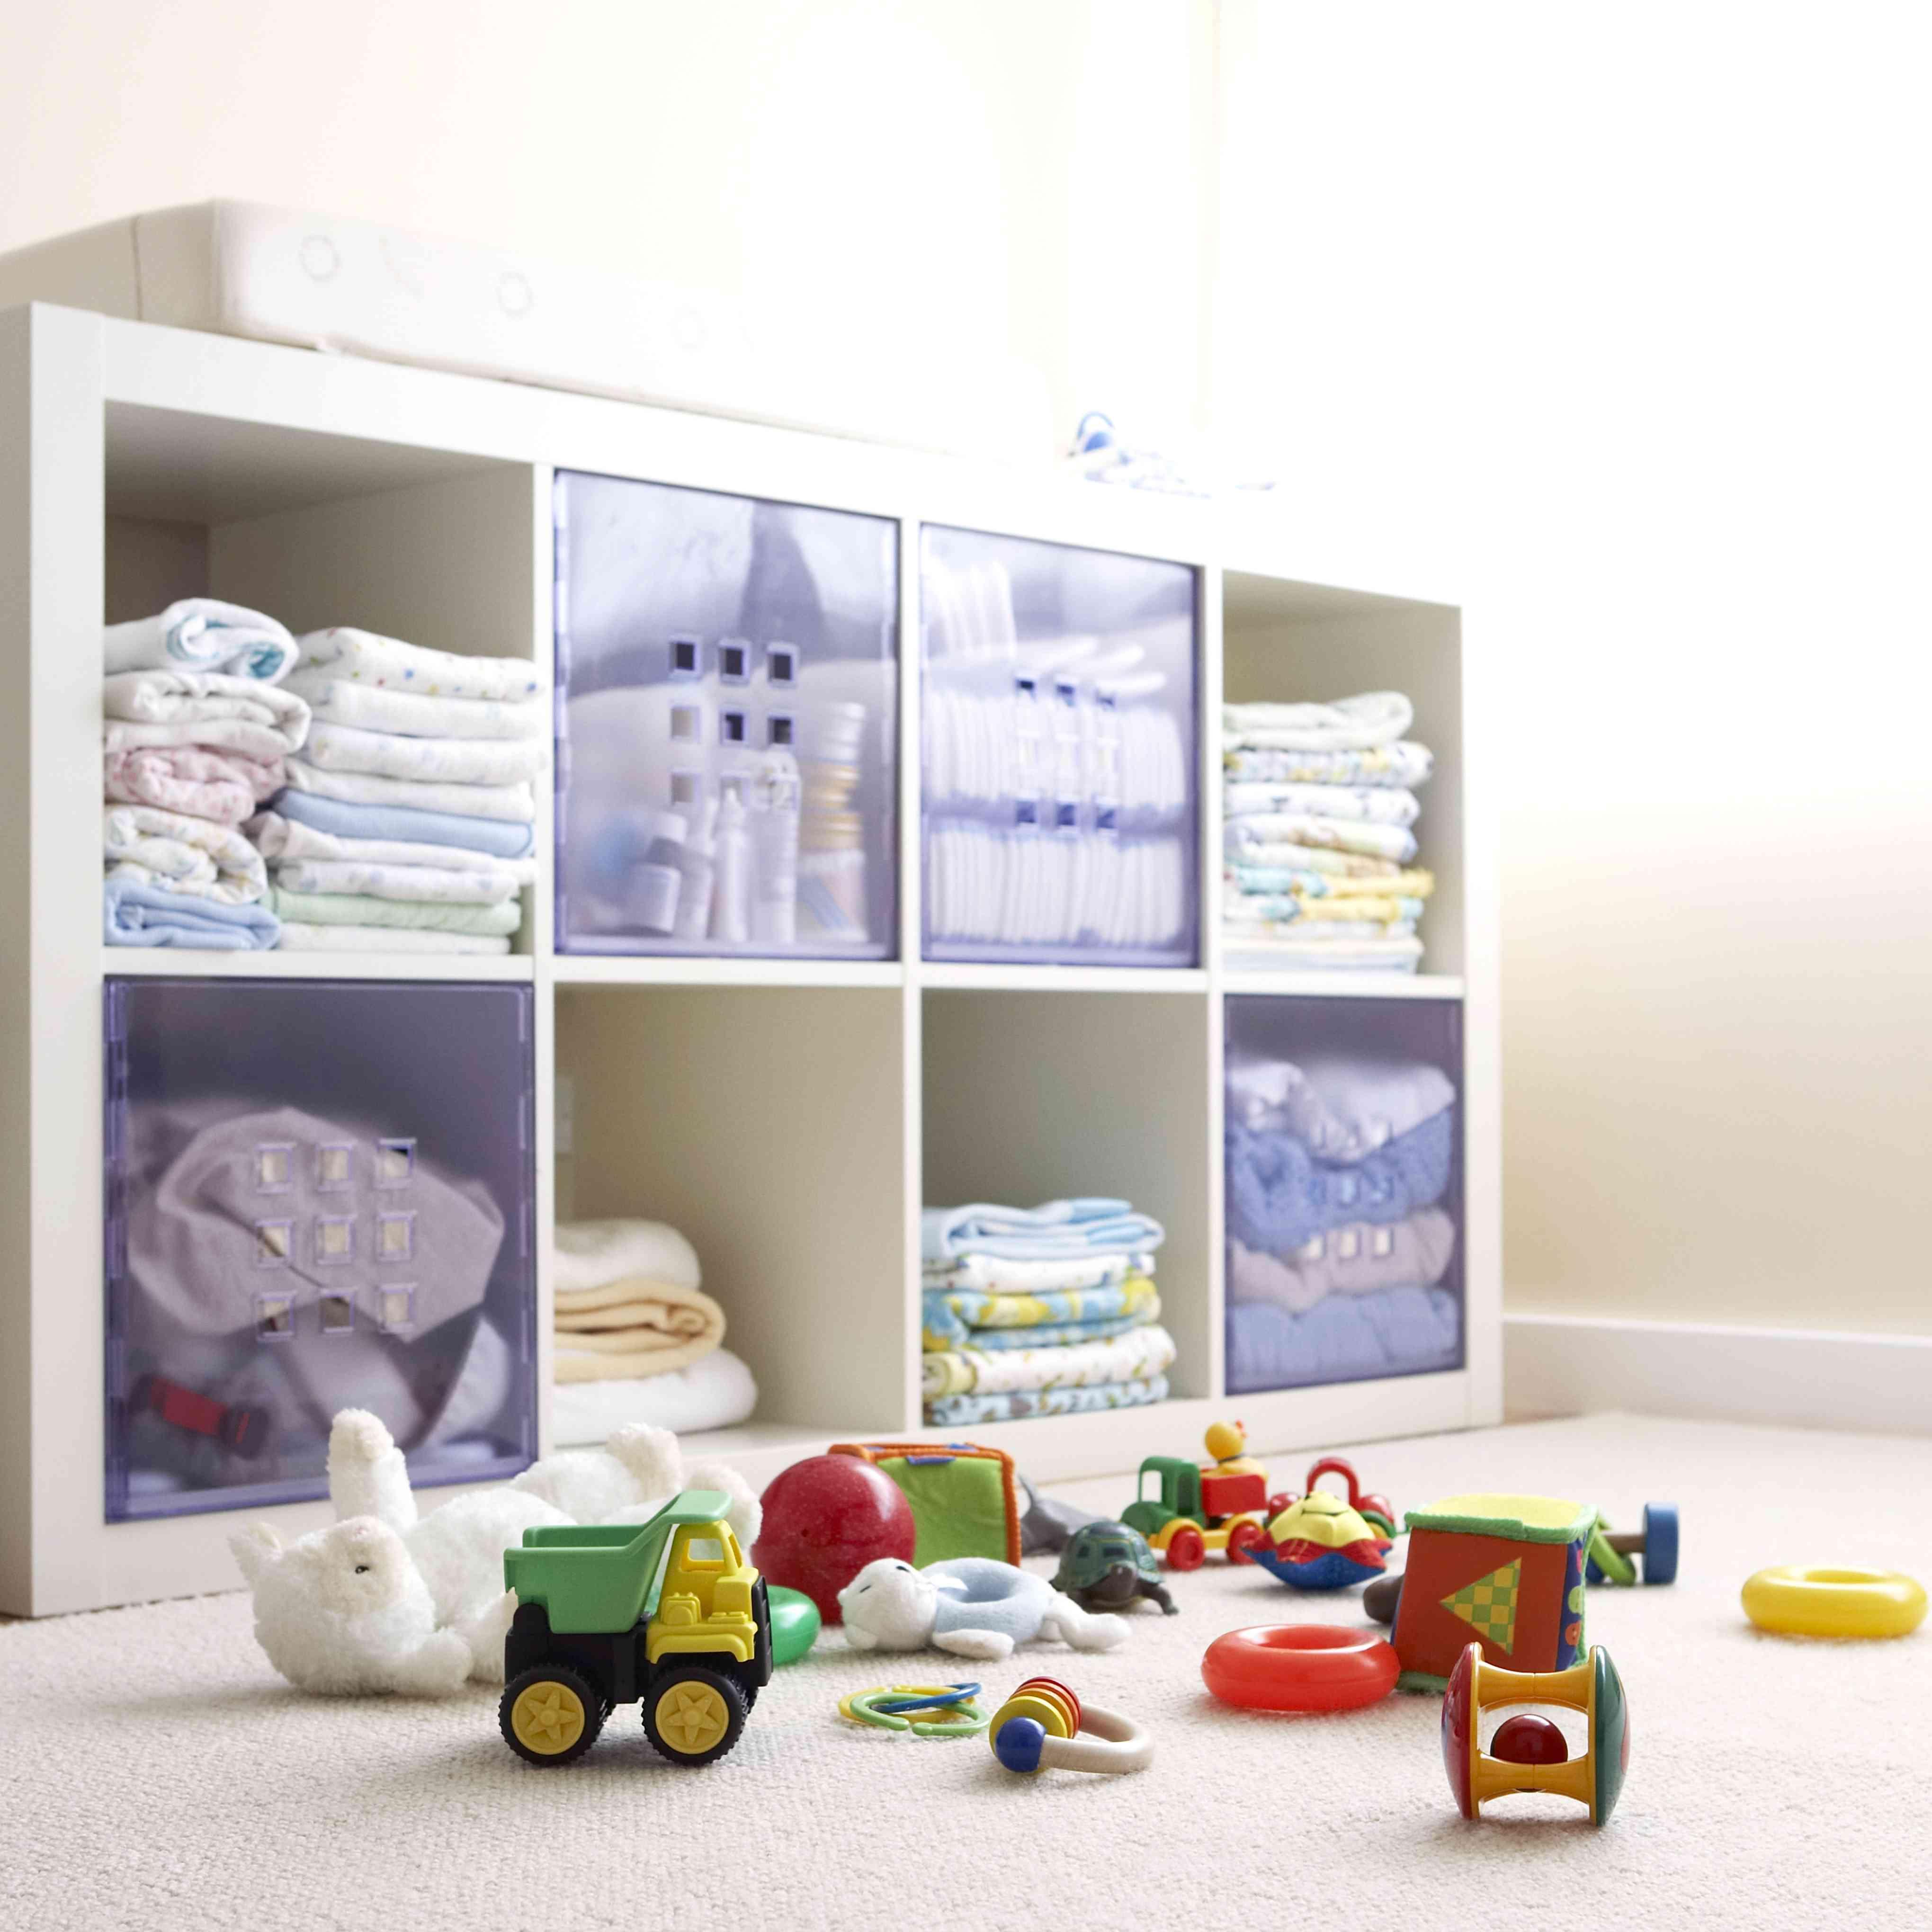 Toys on child's bedroom floor